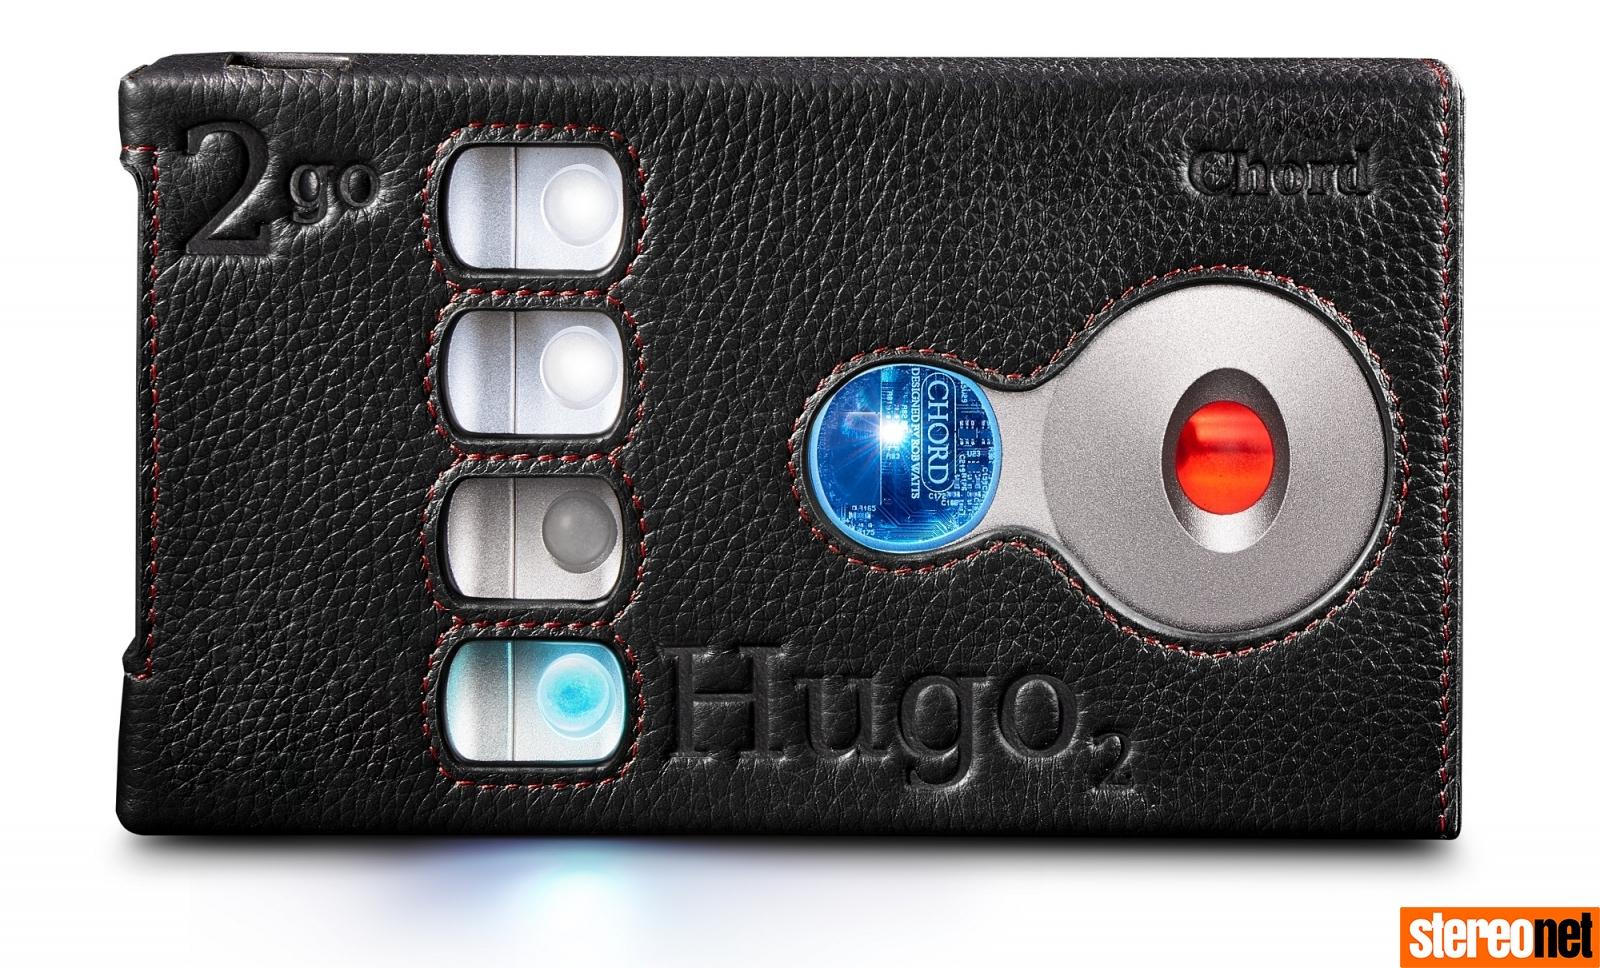 Chord Hugo 2/2go case